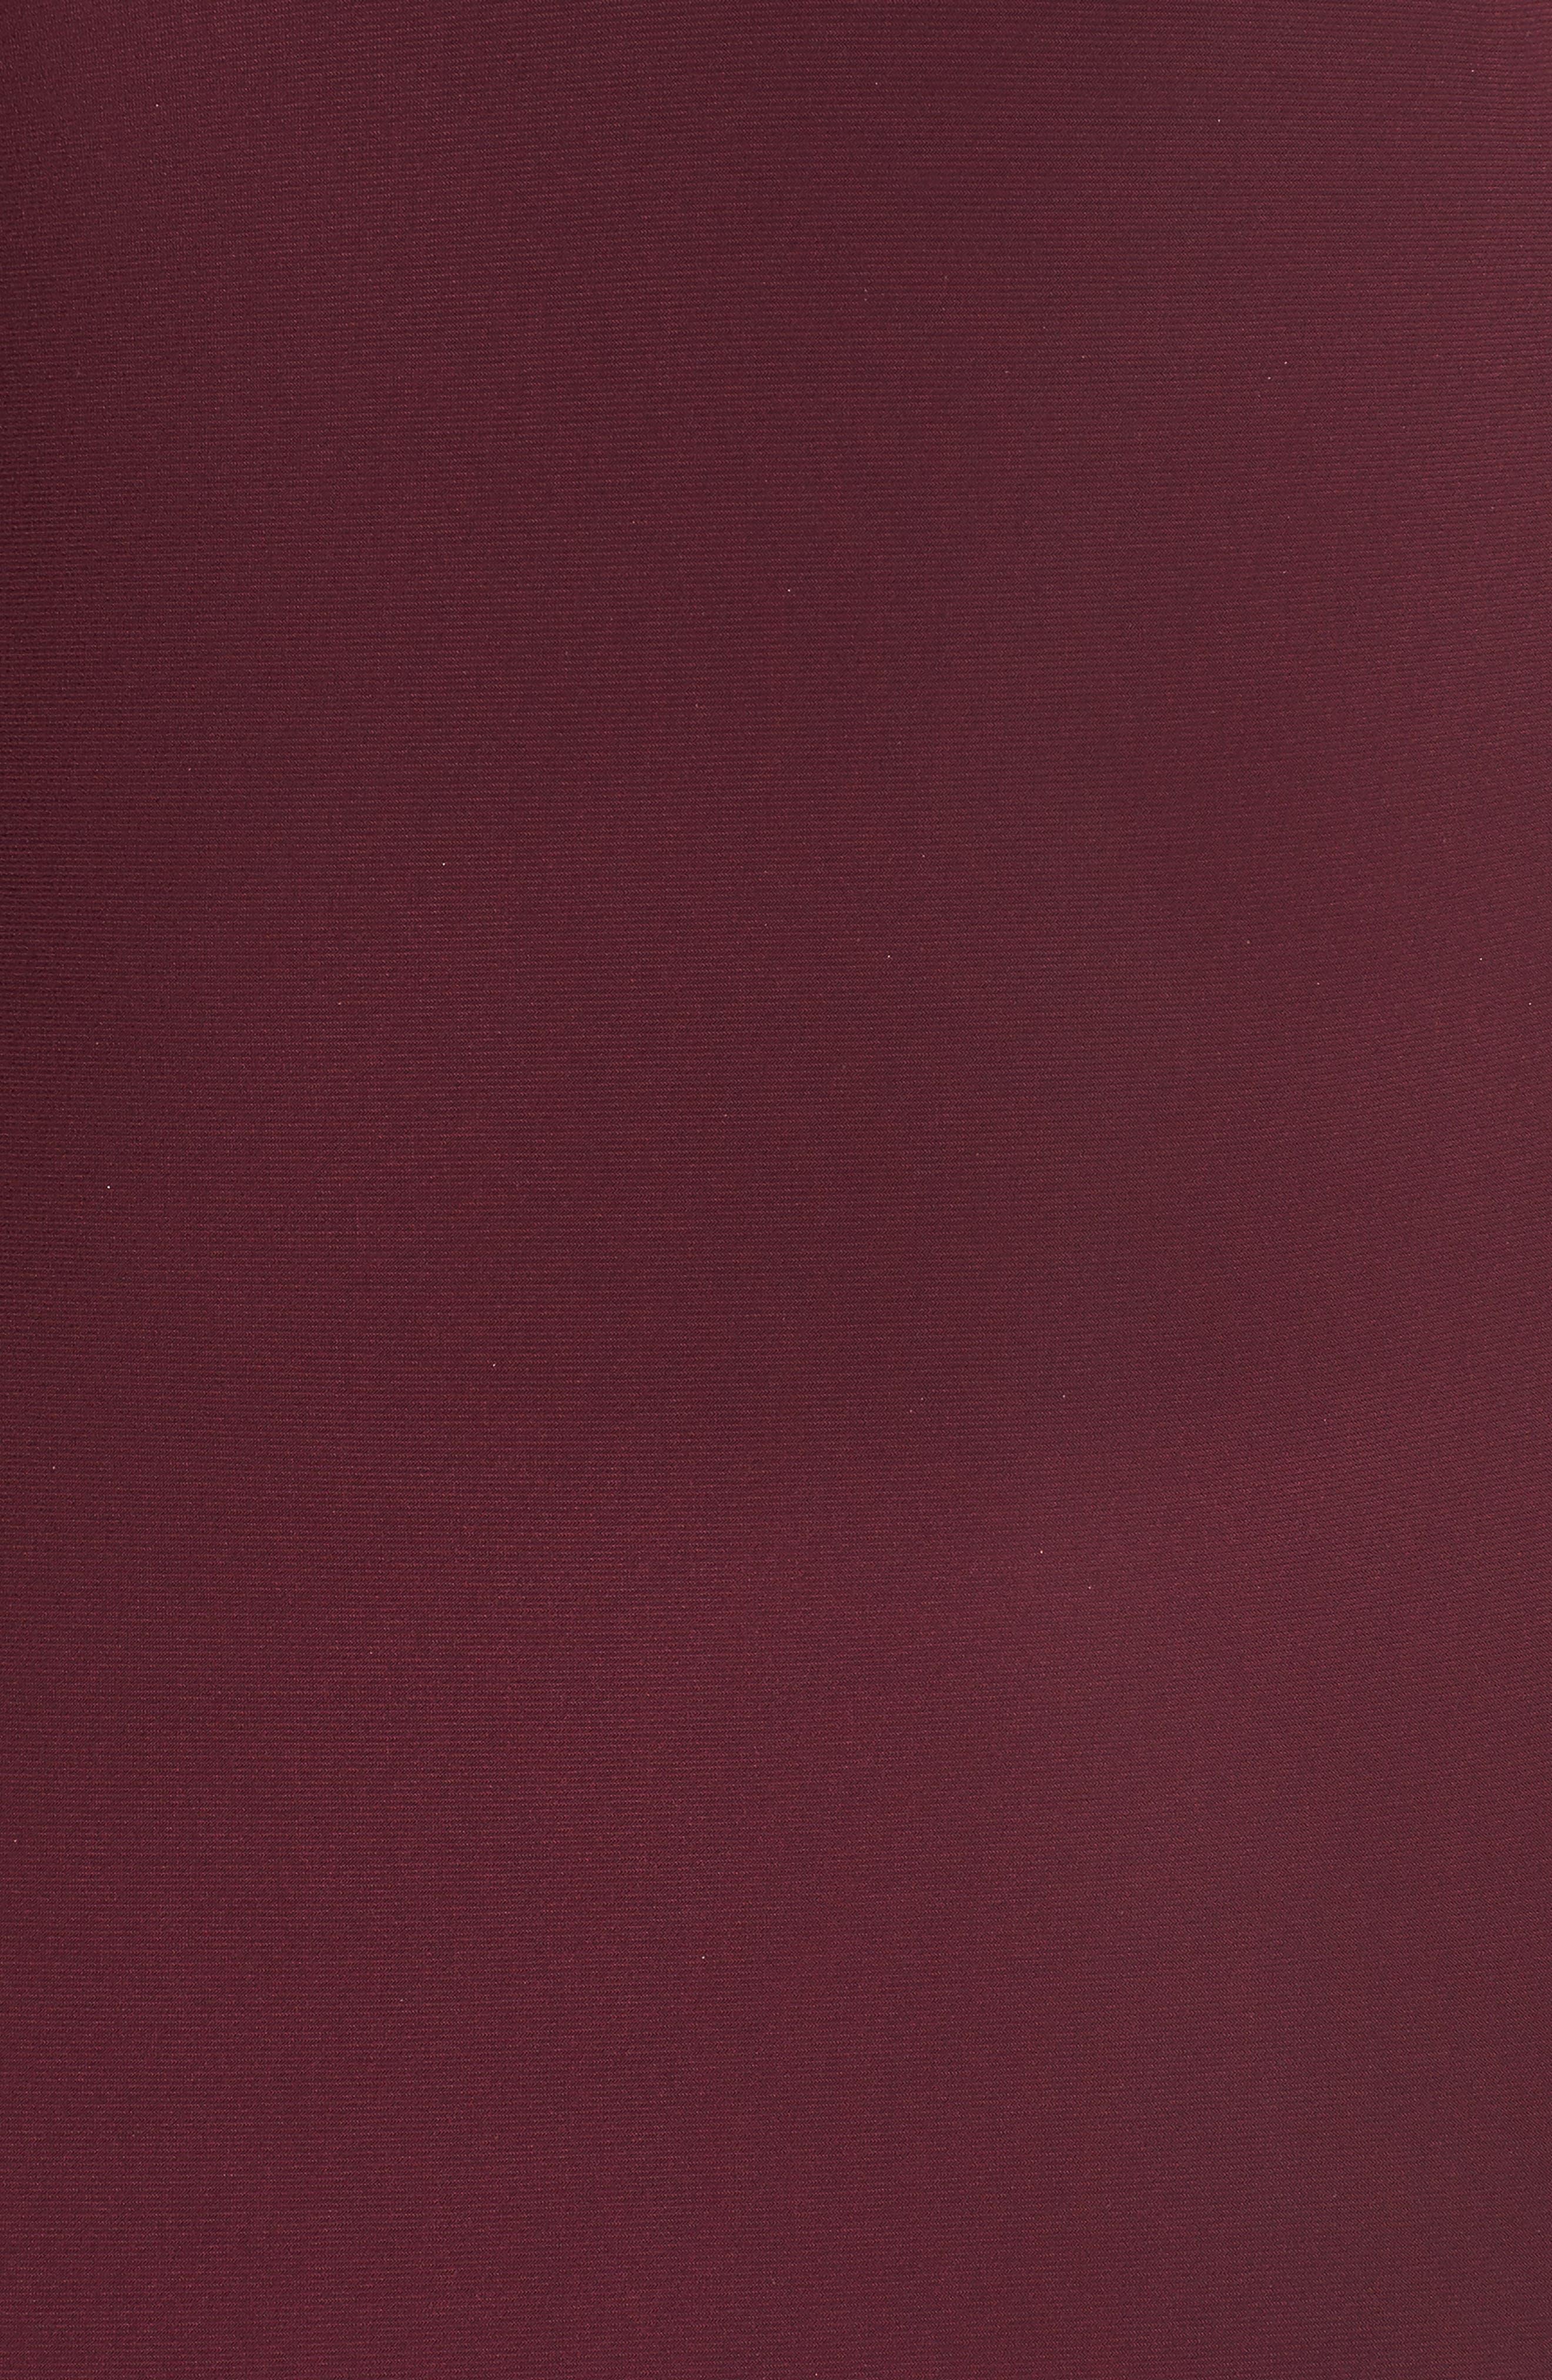 Embellished Back Jersey Gown,                             Alternate thumbnail 5, color,                             607